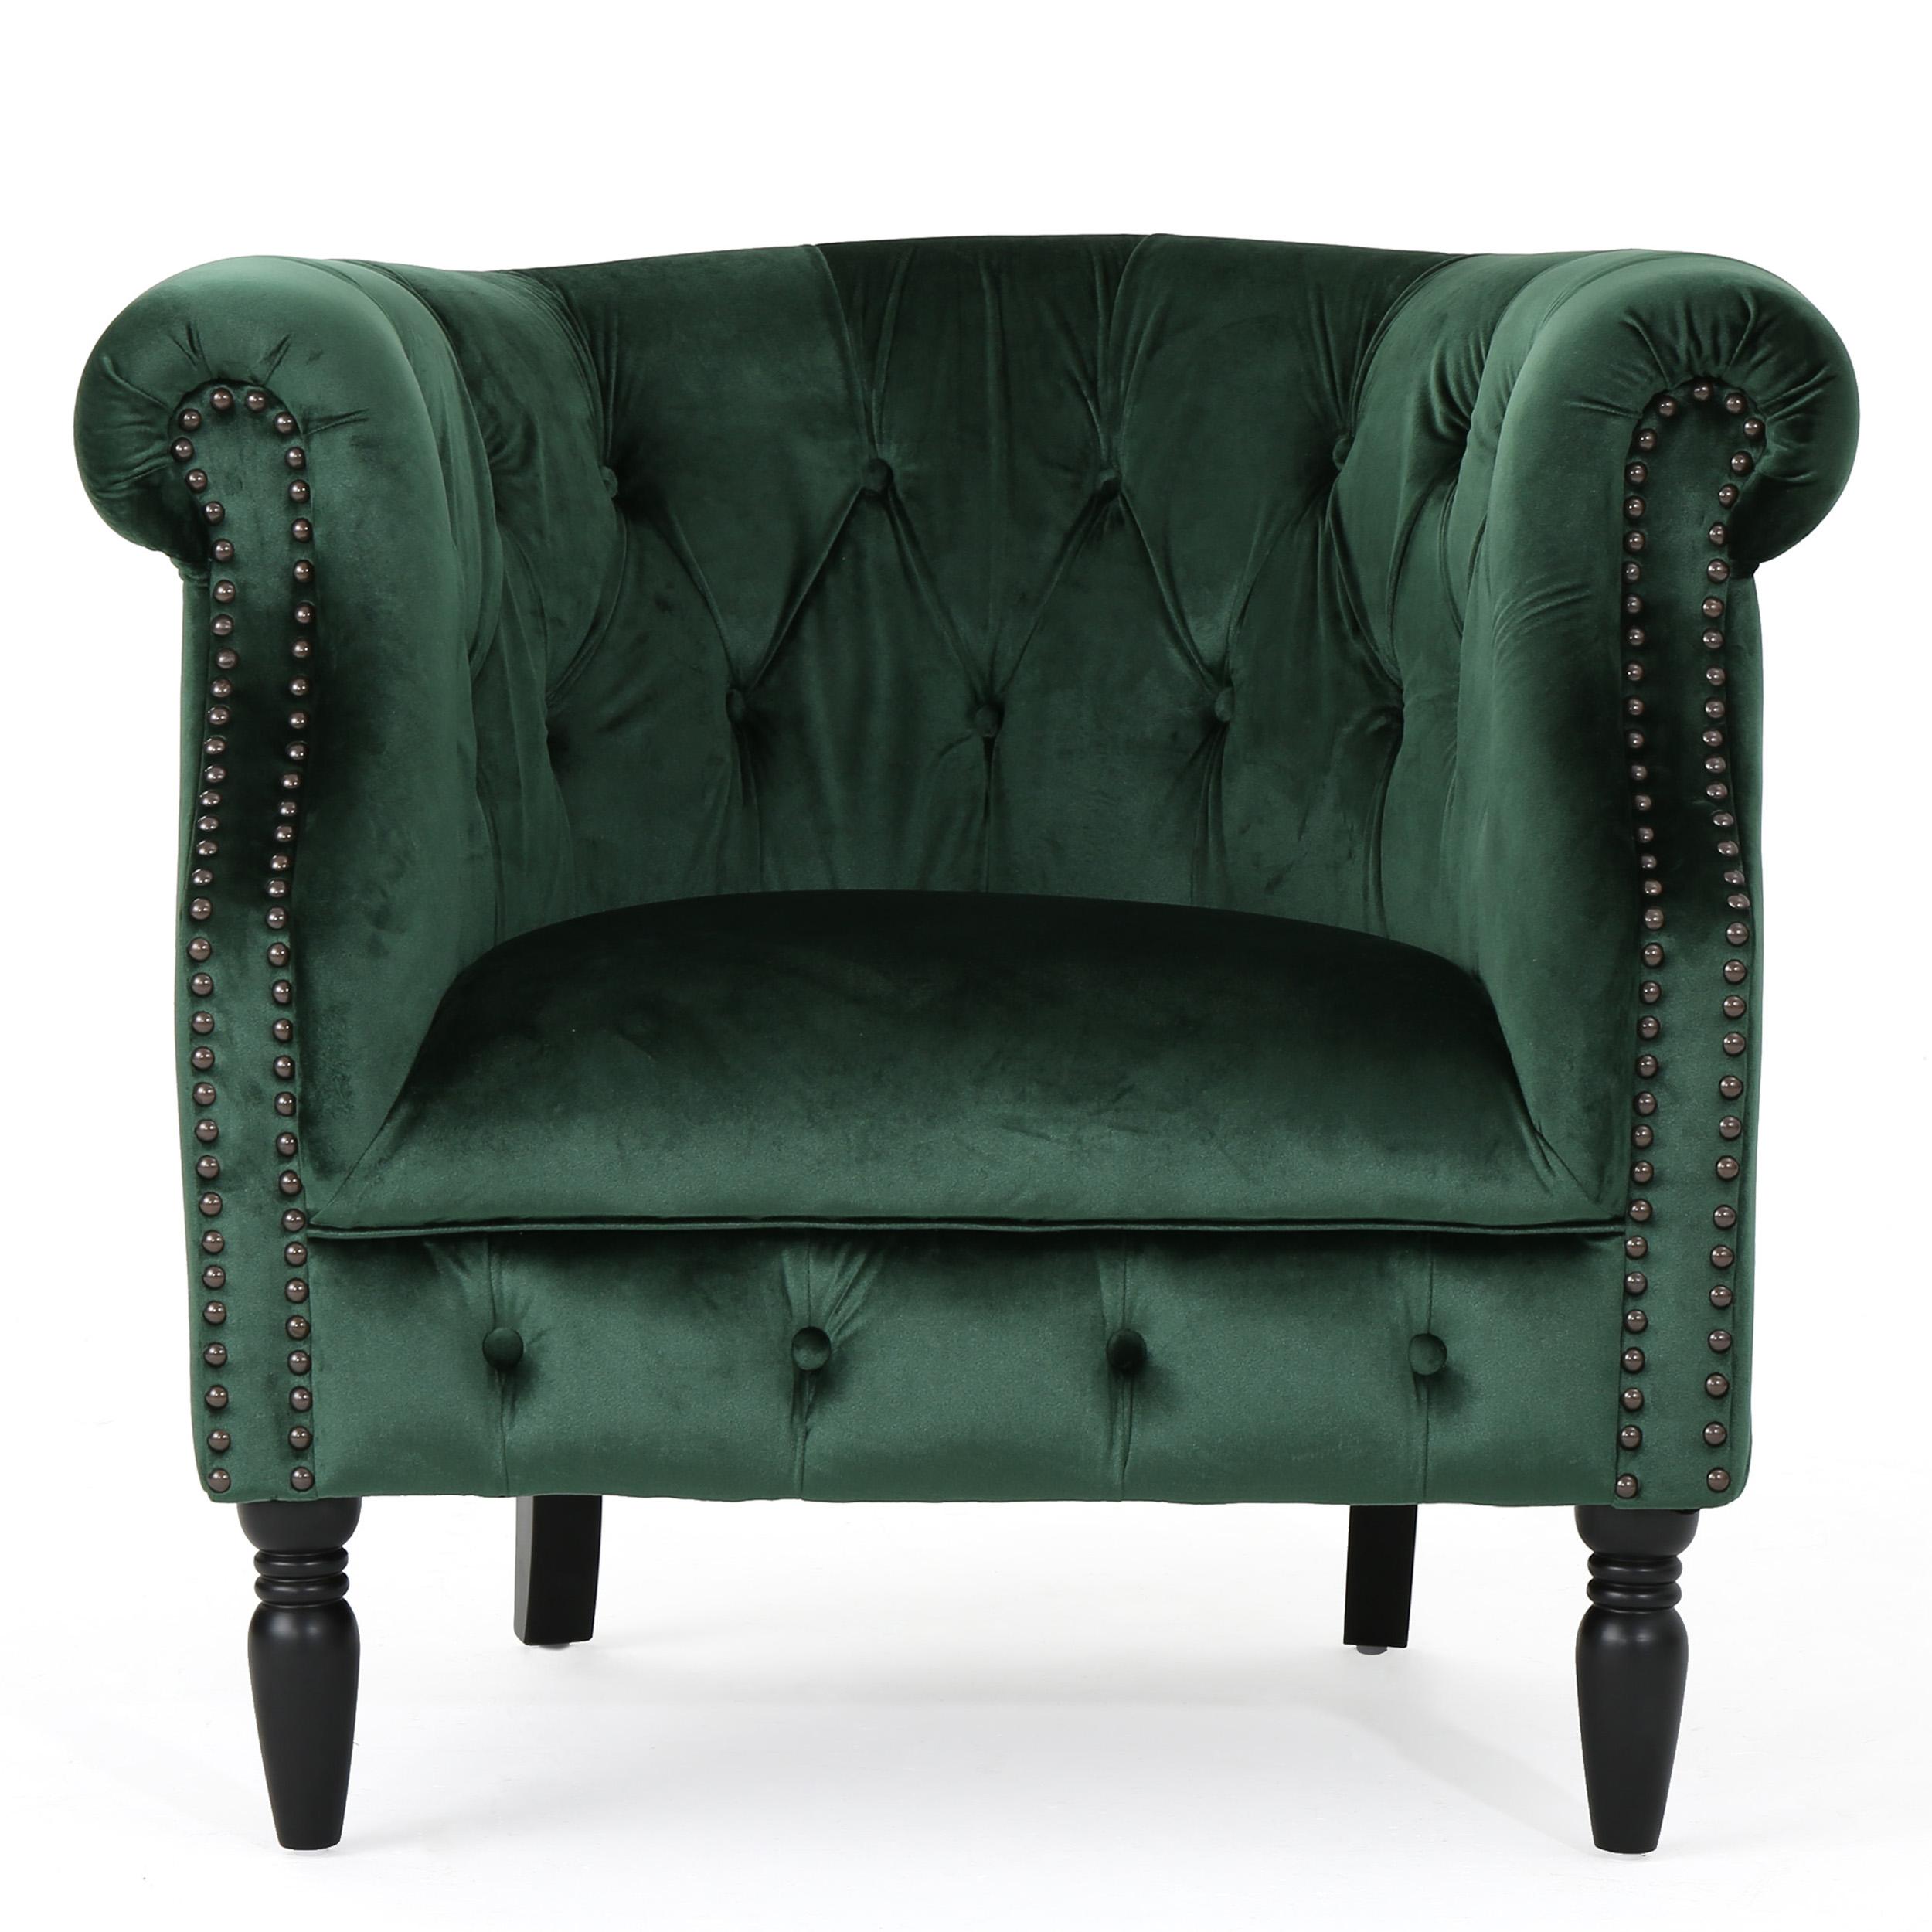 Aries New Velvet Club Chair, Emerald